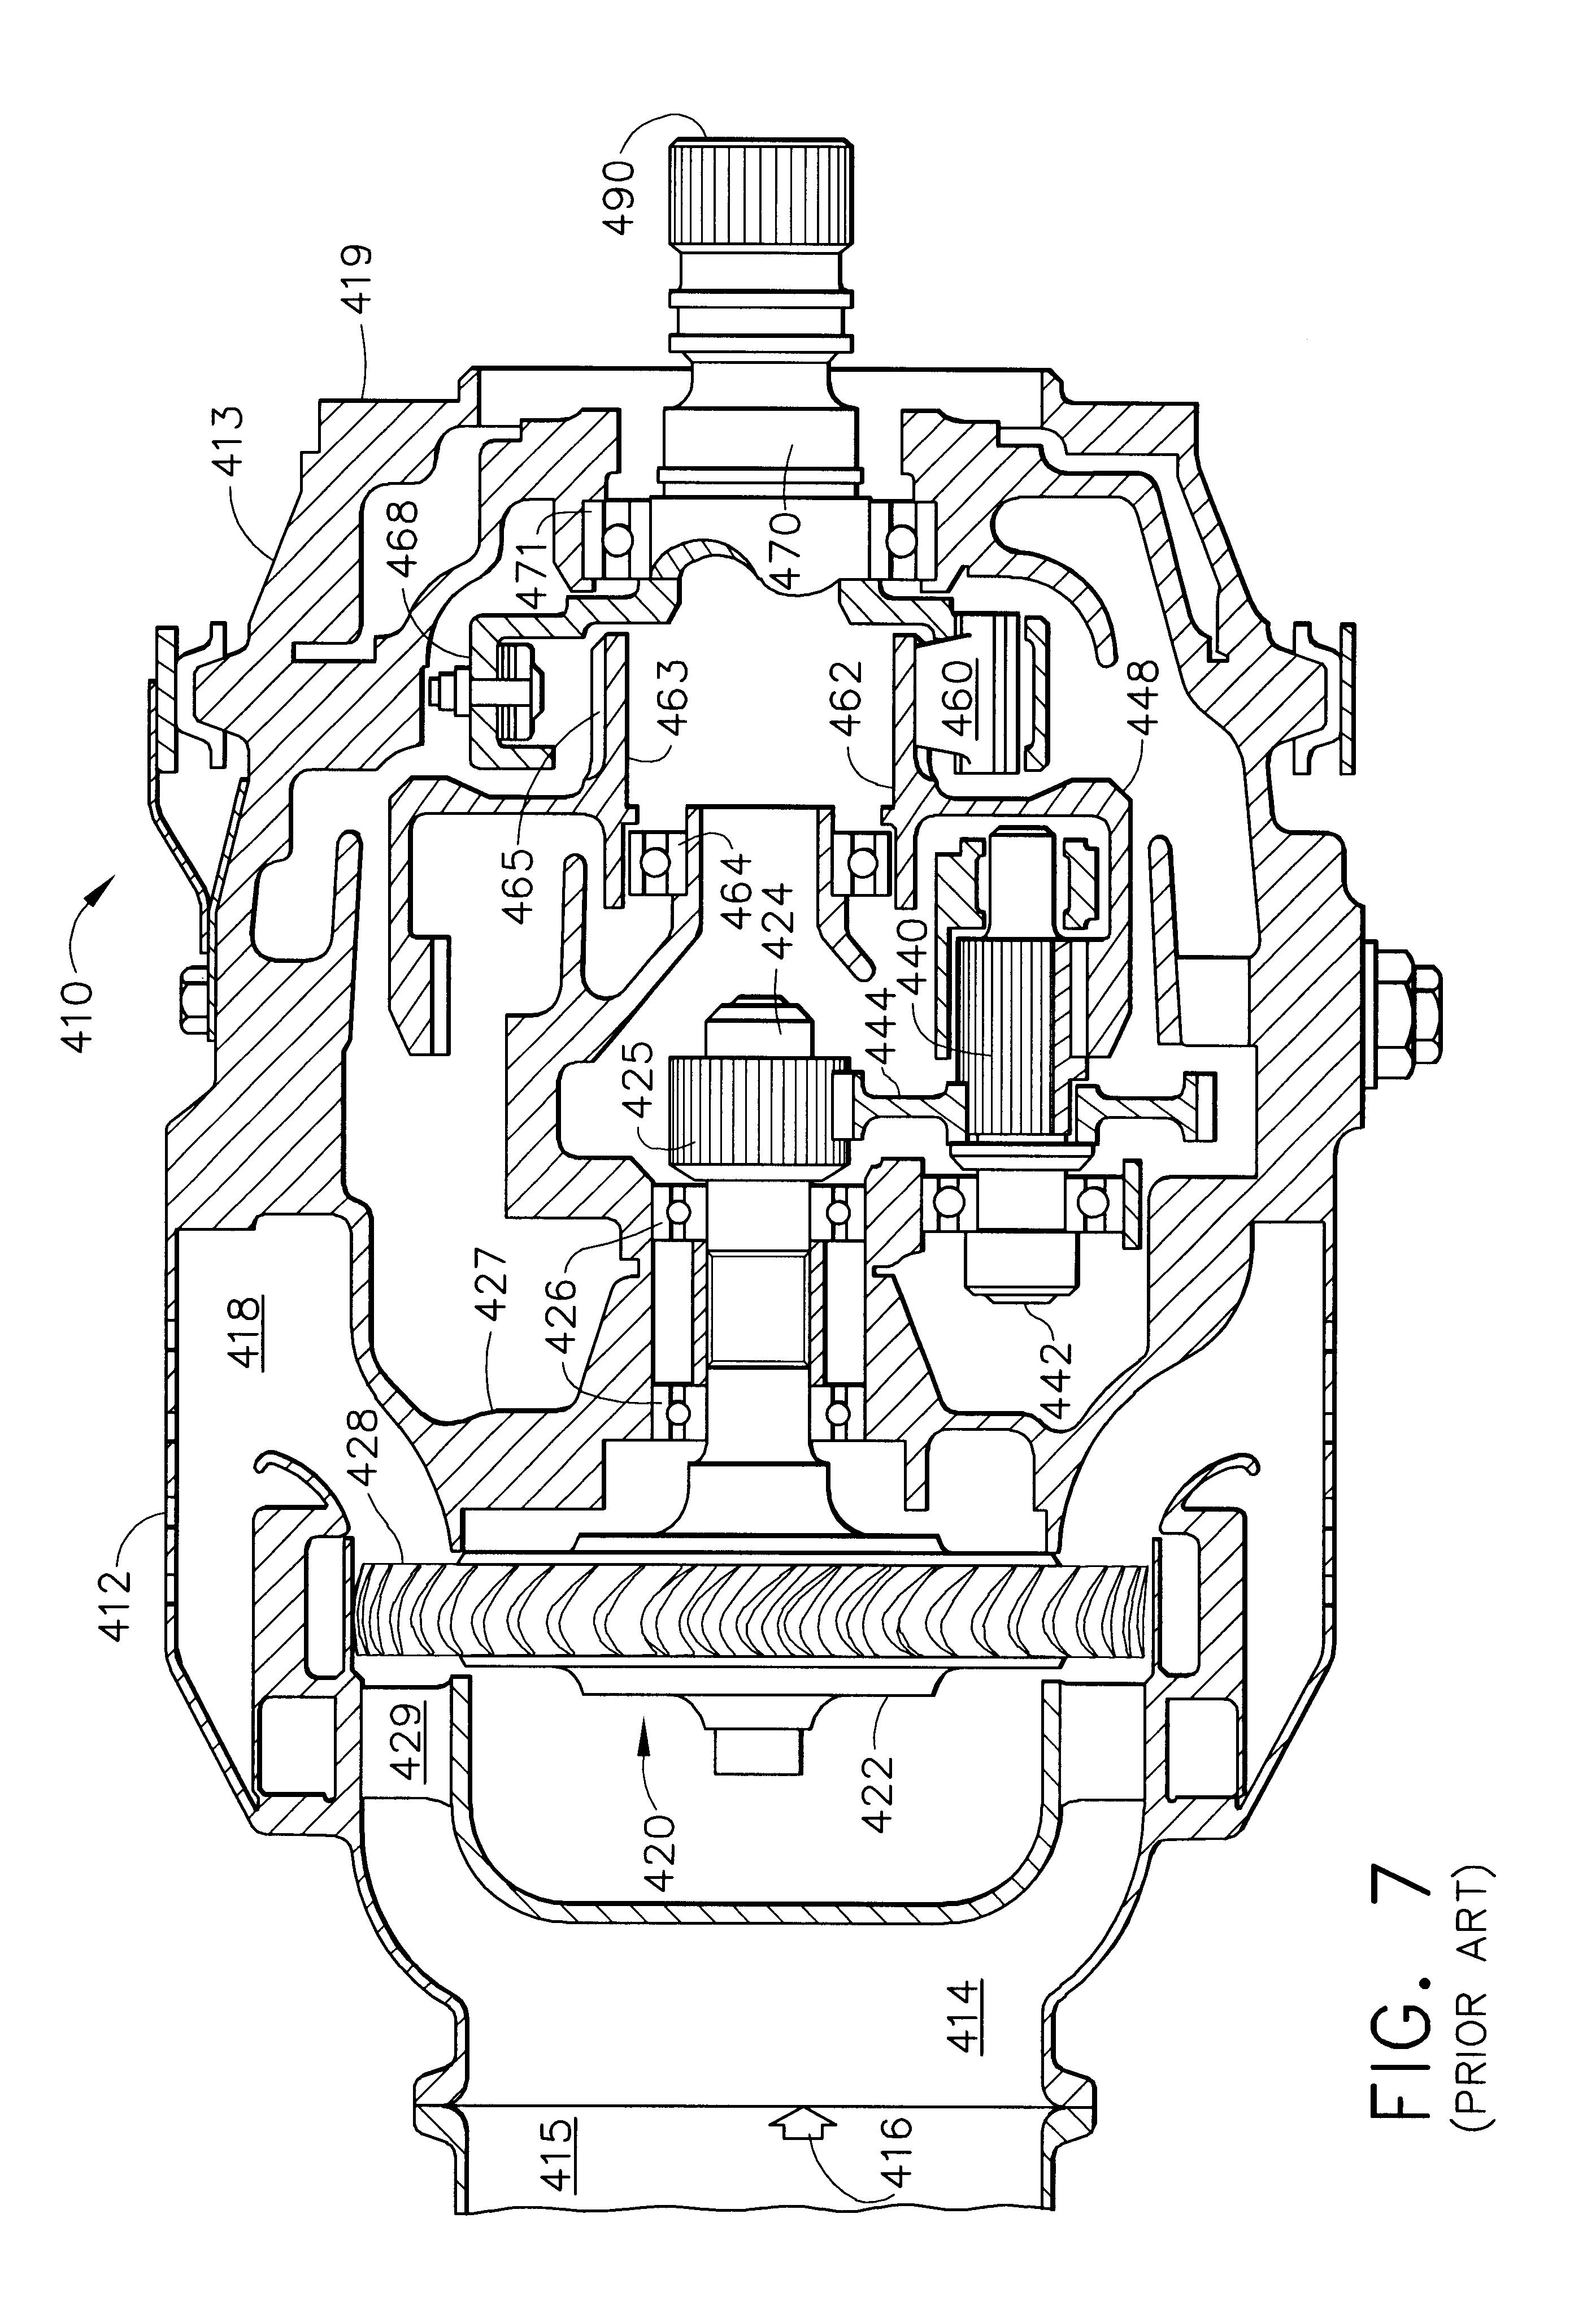 patent us dual actuator air turbine starter valve patent drawing